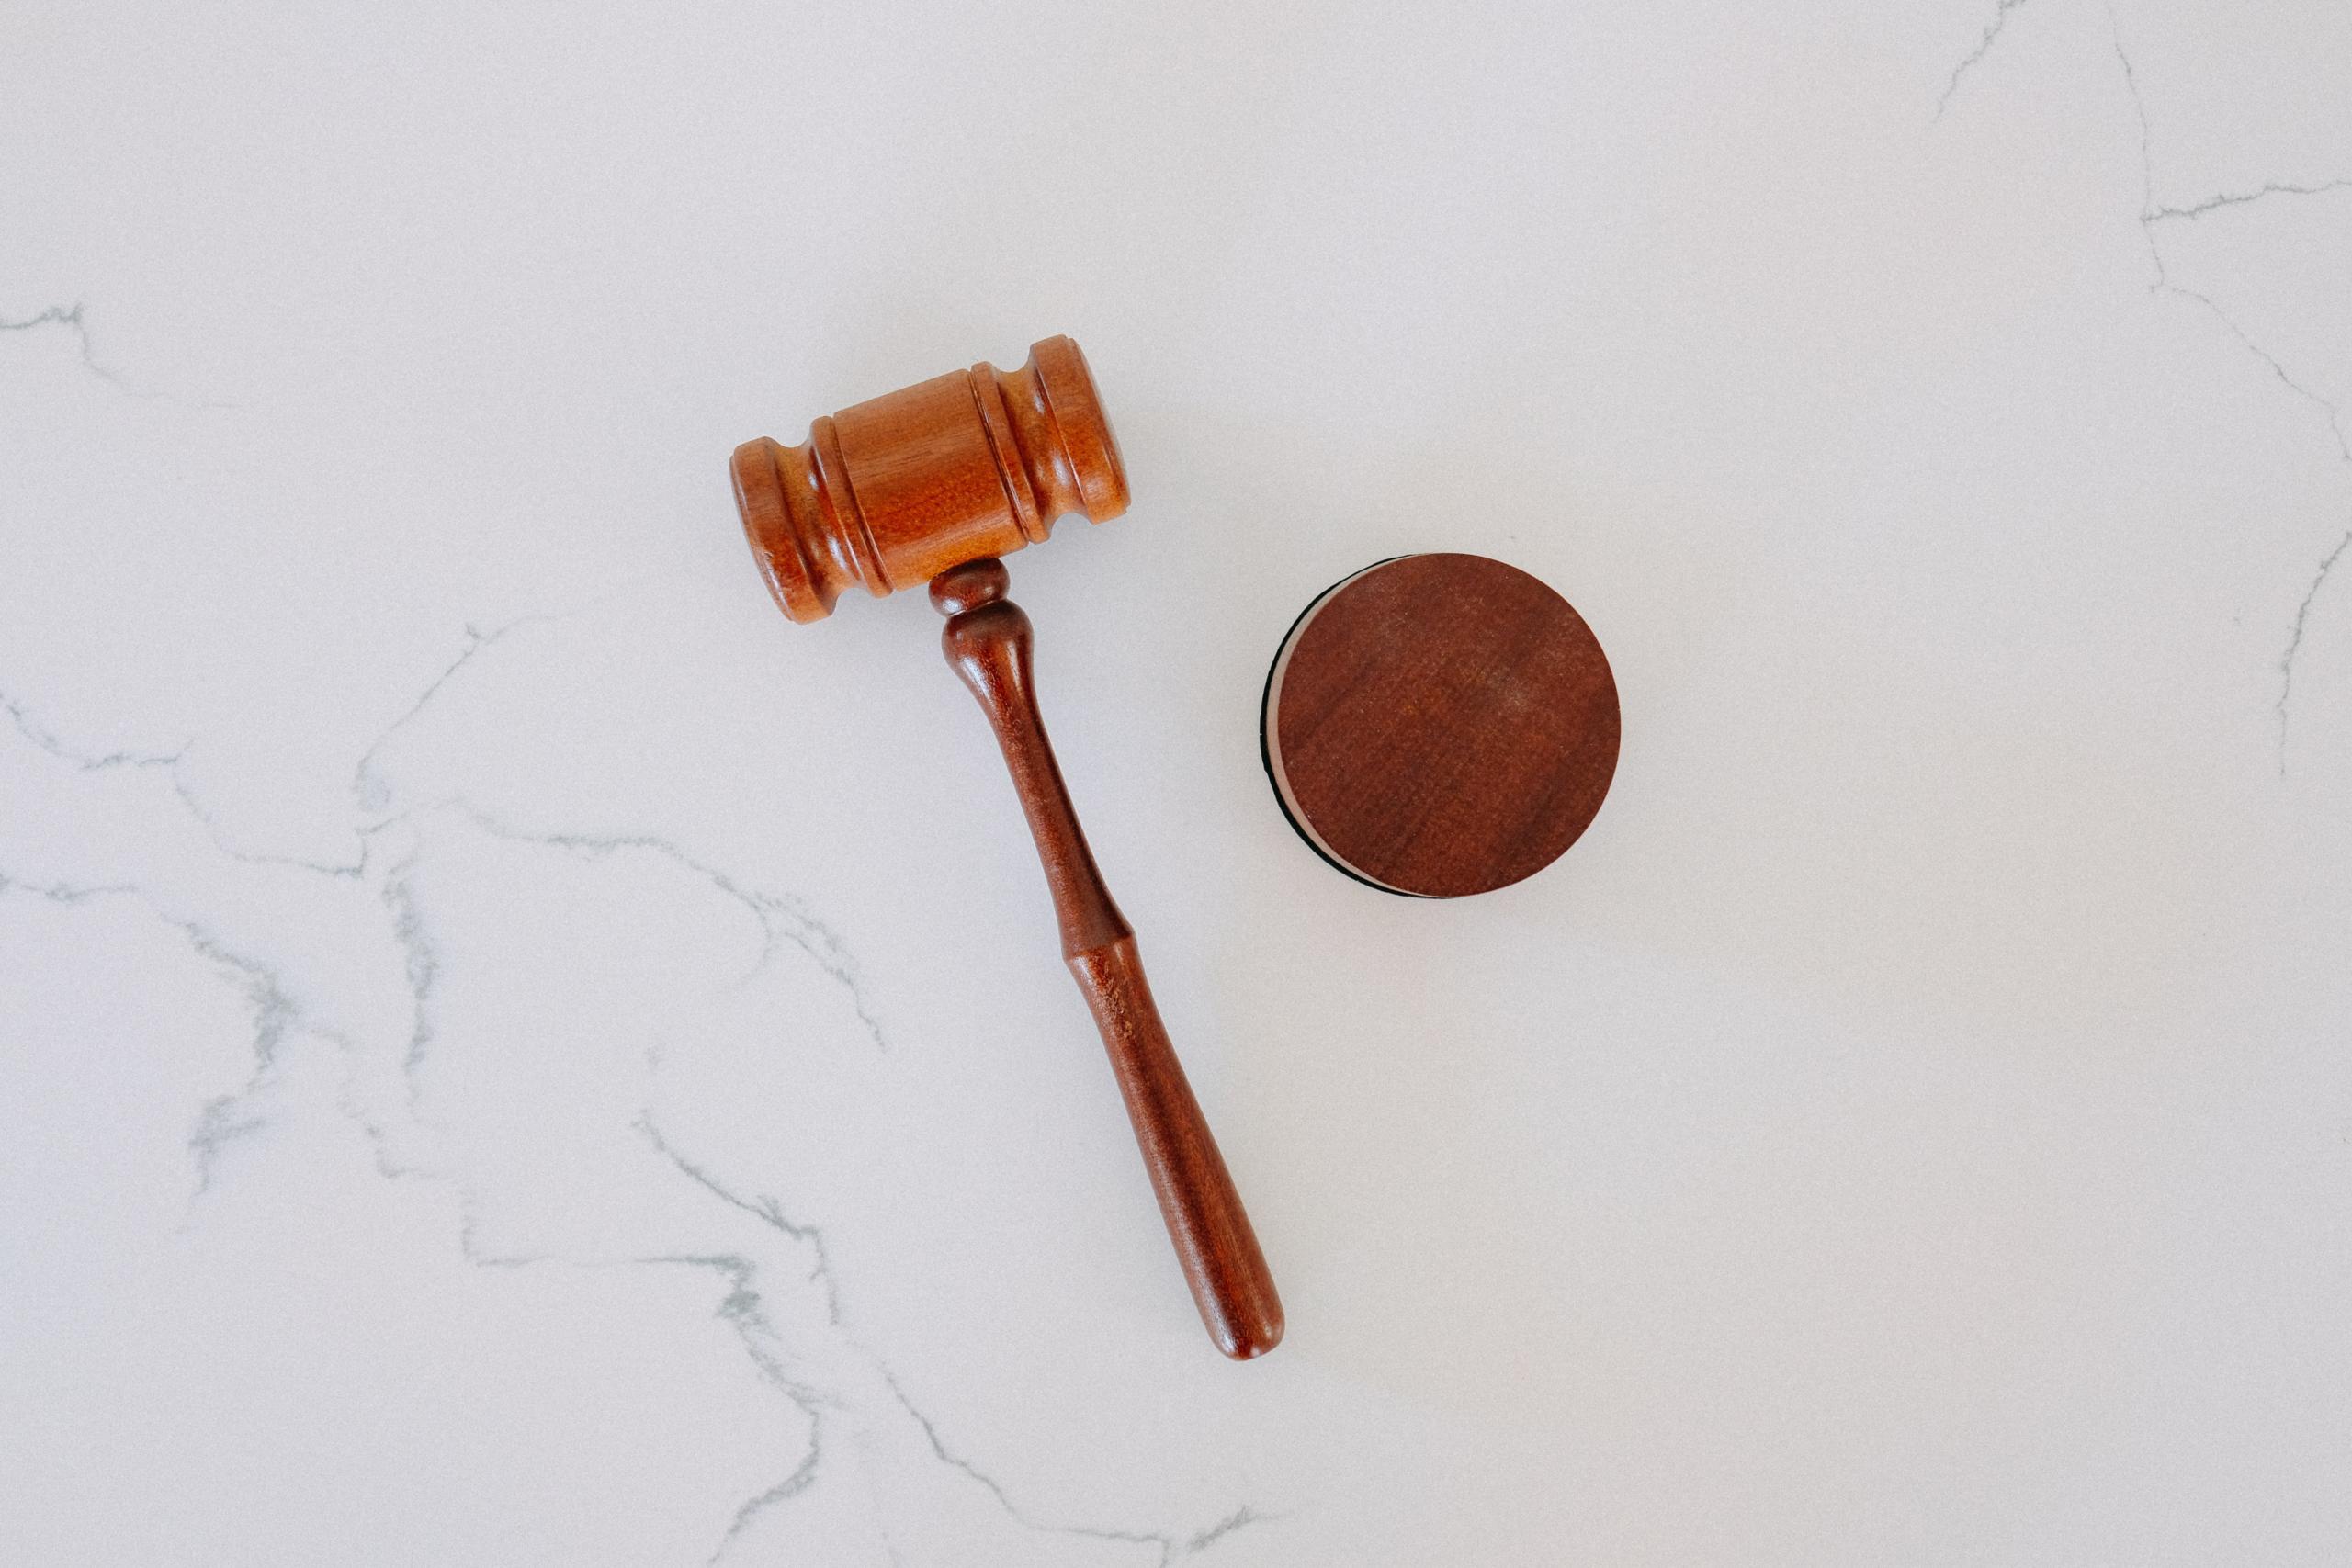 tingey-injury-law-firm-6sl88x150Xs-unsplash